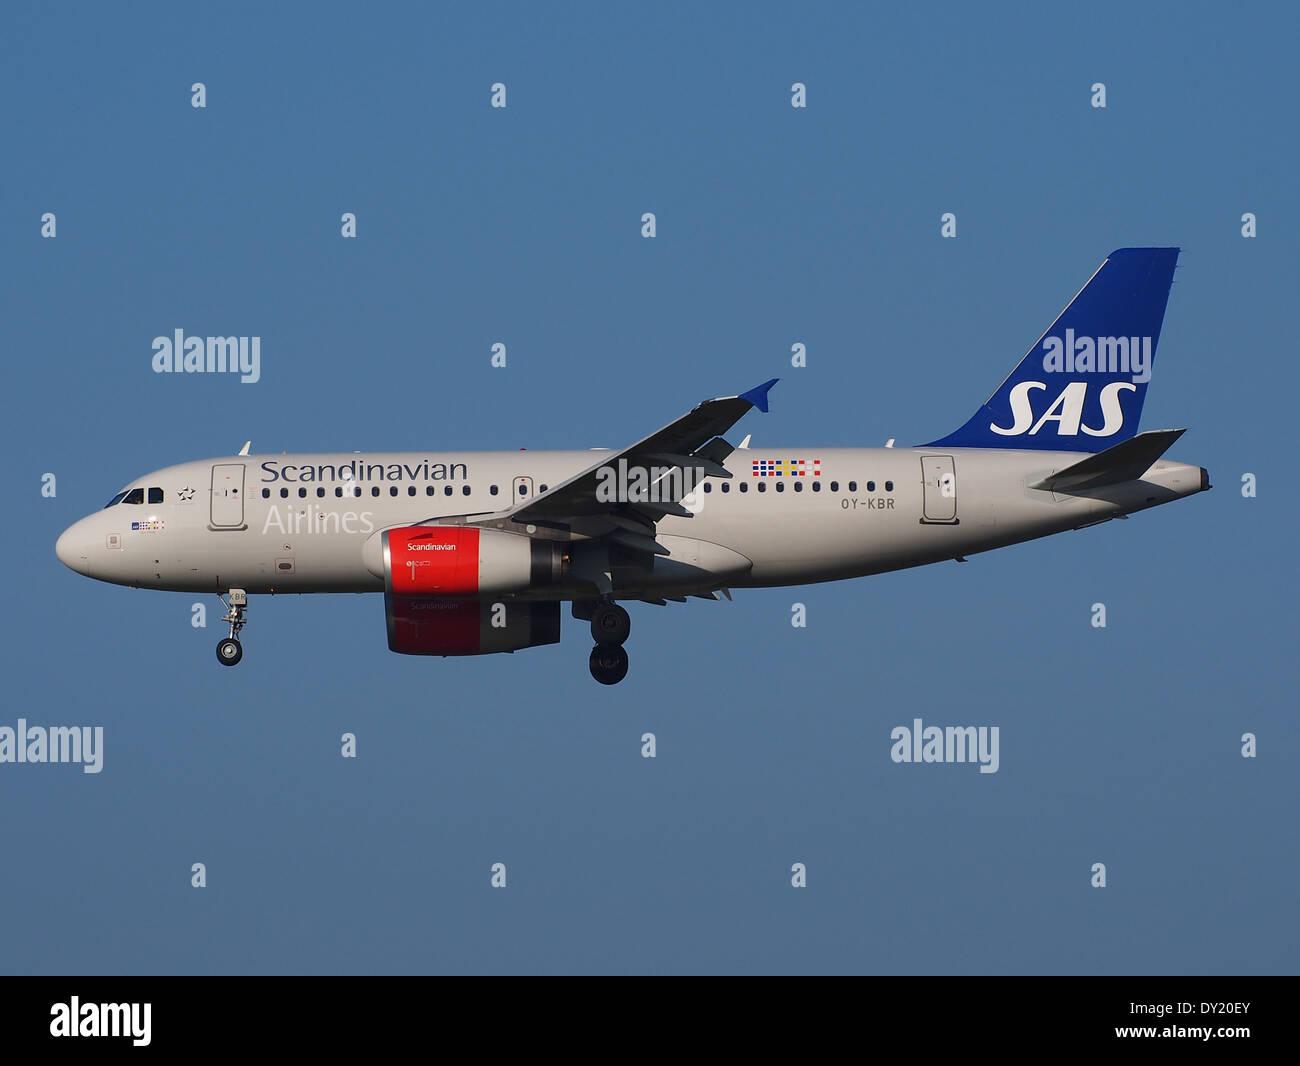 OY-KBR SAS Scandinavian Airlines Airbus A319-131, l'atterrissage sur Schiphol, pic-2 Photo Stock